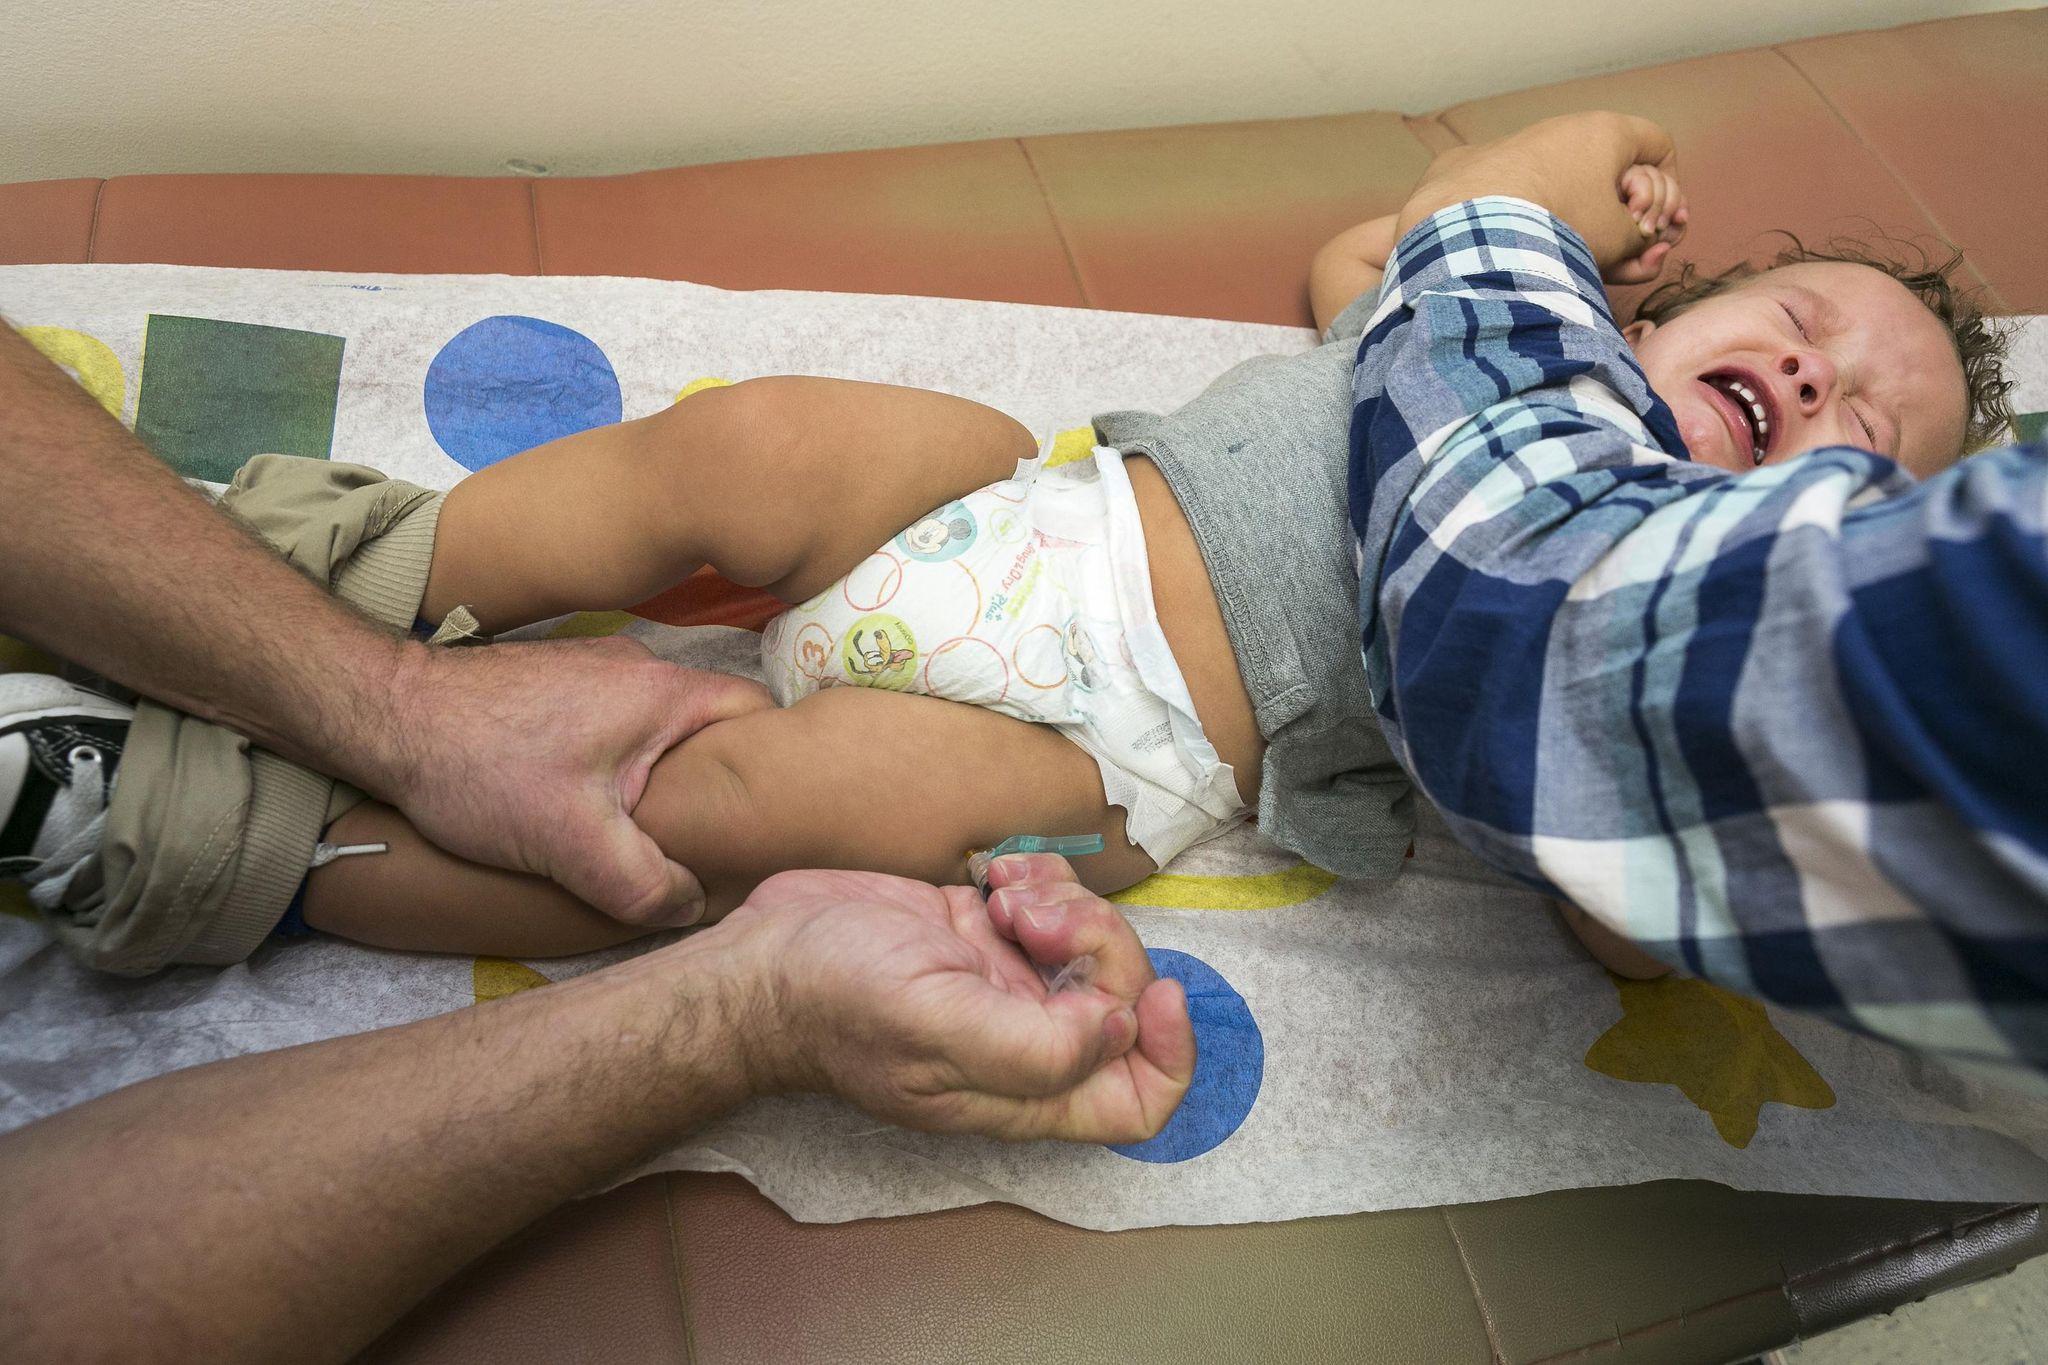 'Dangerous stagnation': Measles vaccine rates alarm global health organizations